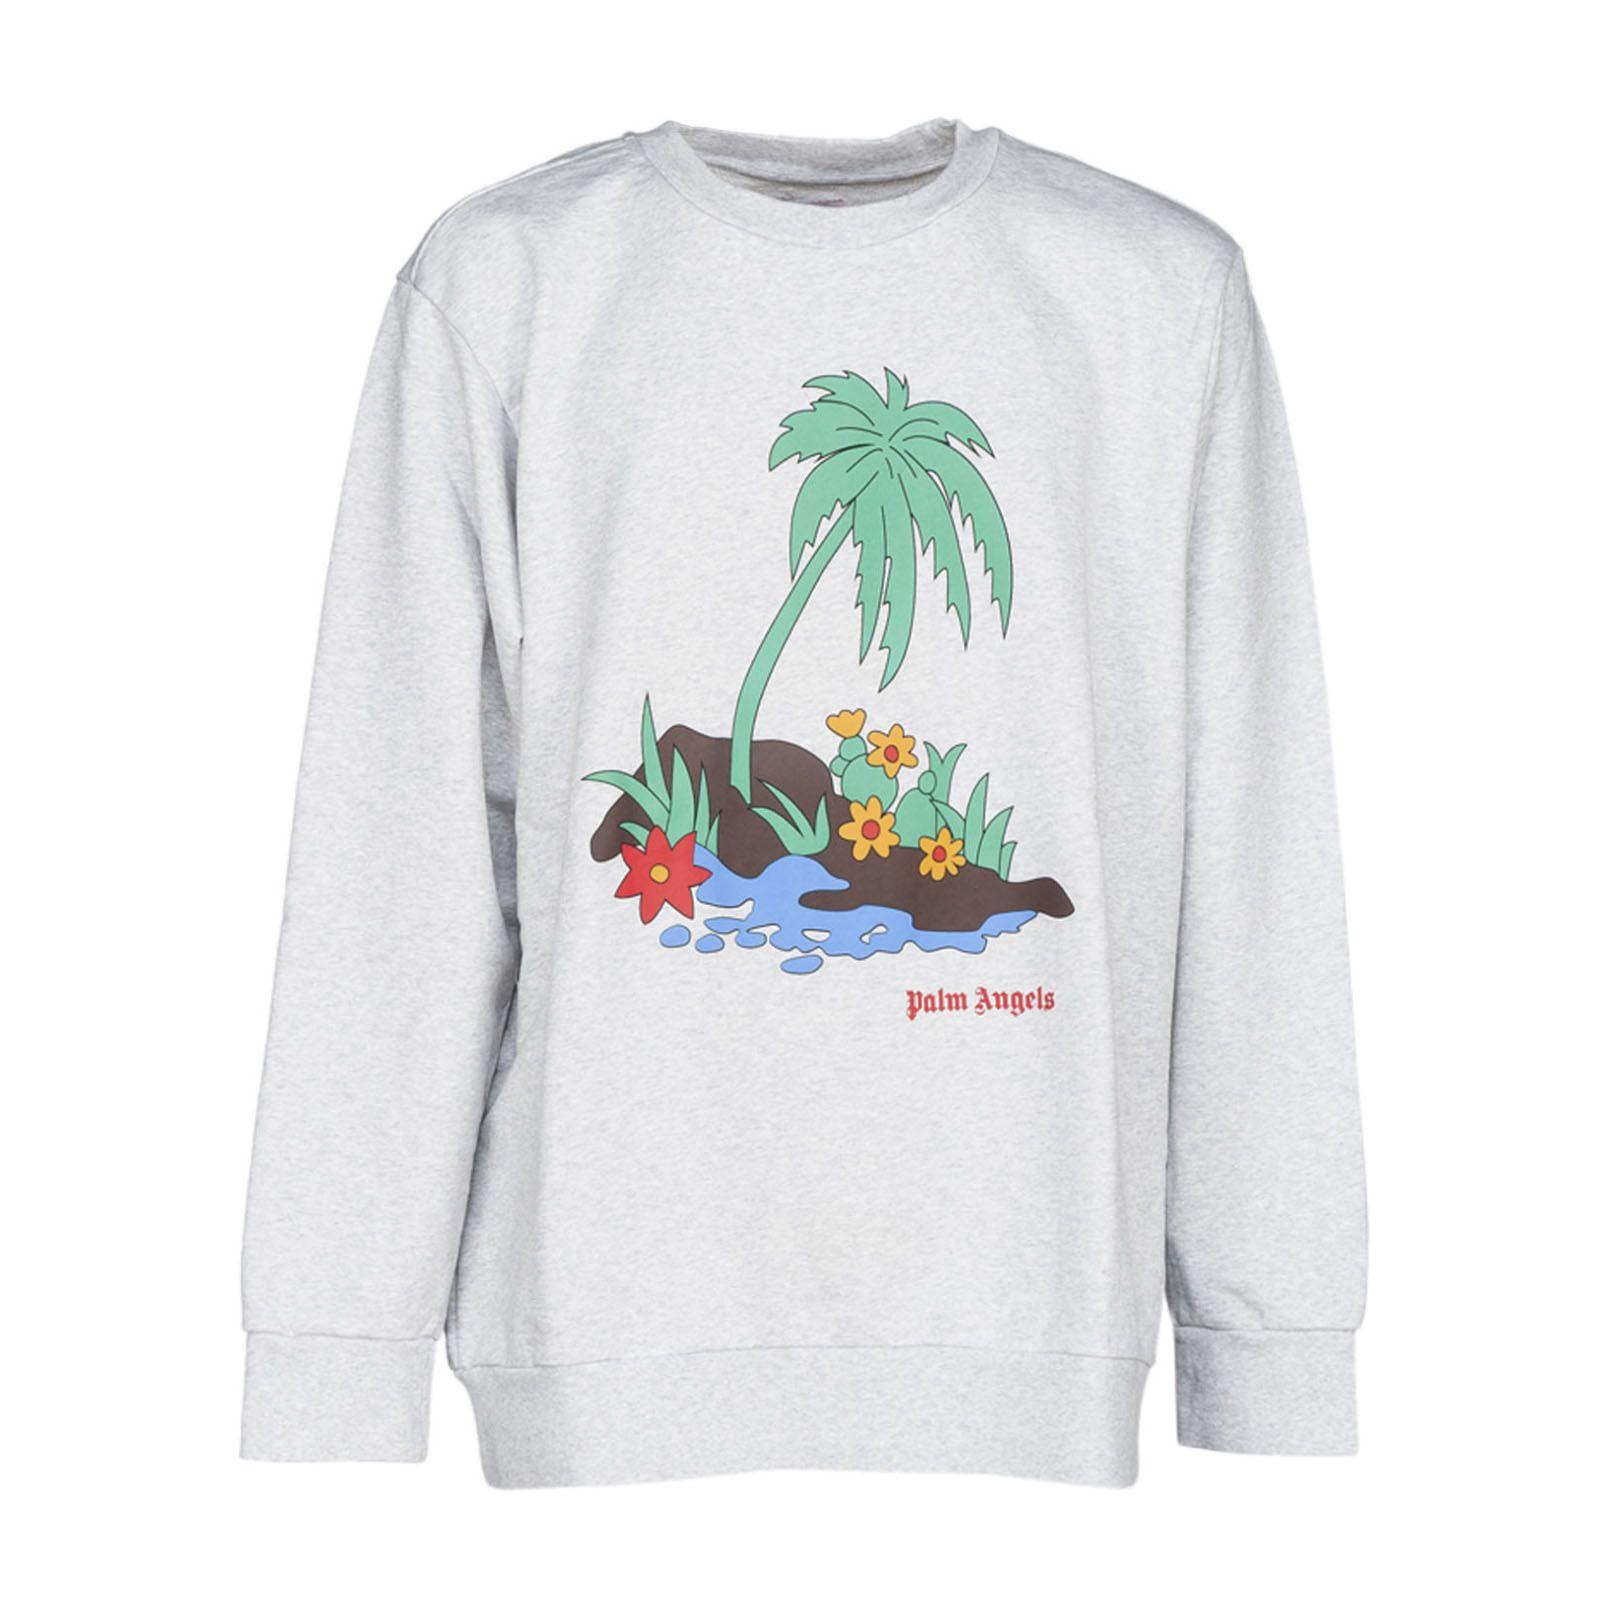 Palm Angels palm Island Sweatshirt